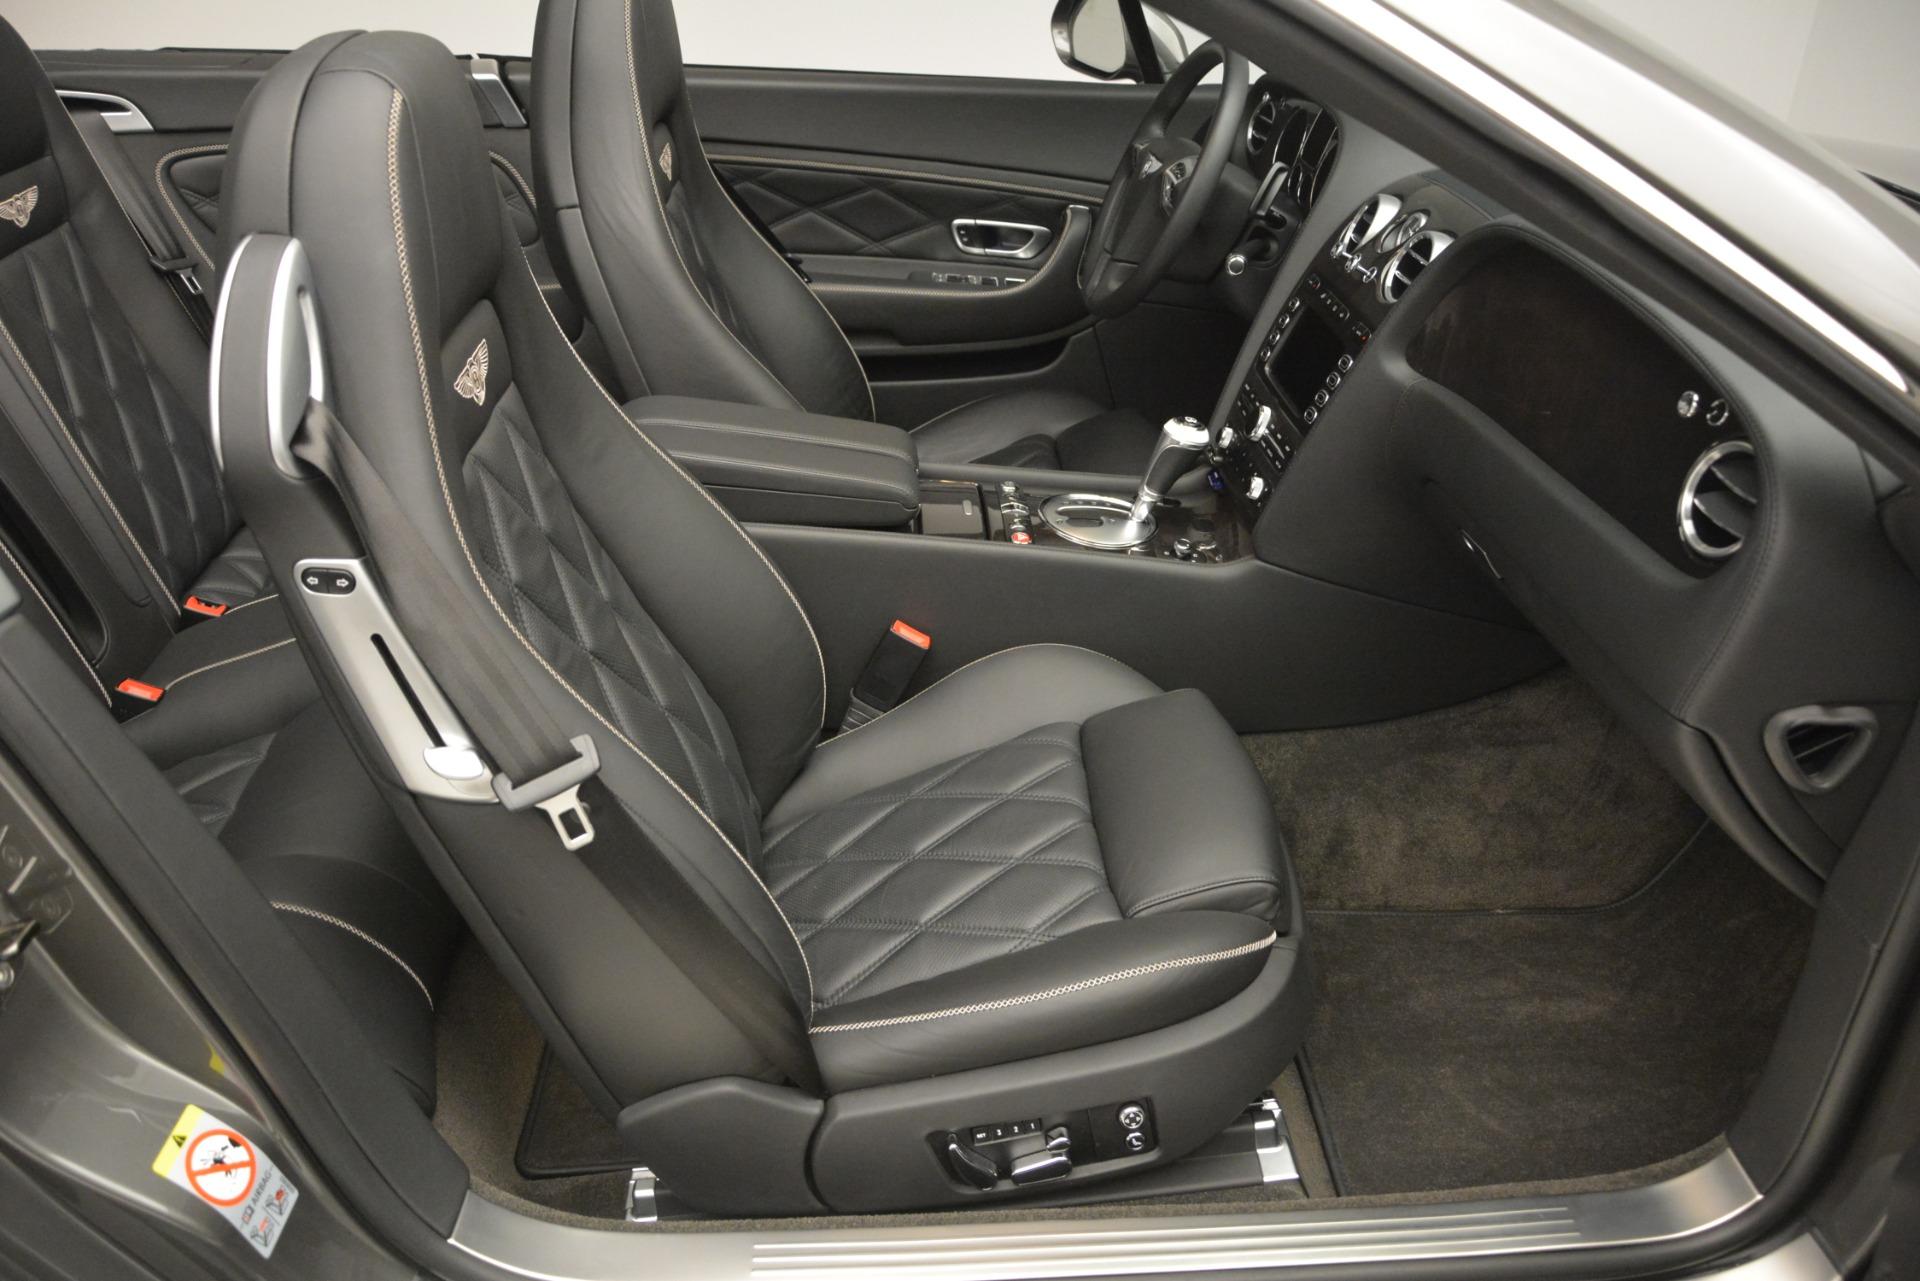 Used 2010 Bentley Continental GT Speed For Sale In Westport, CT 2677_p31